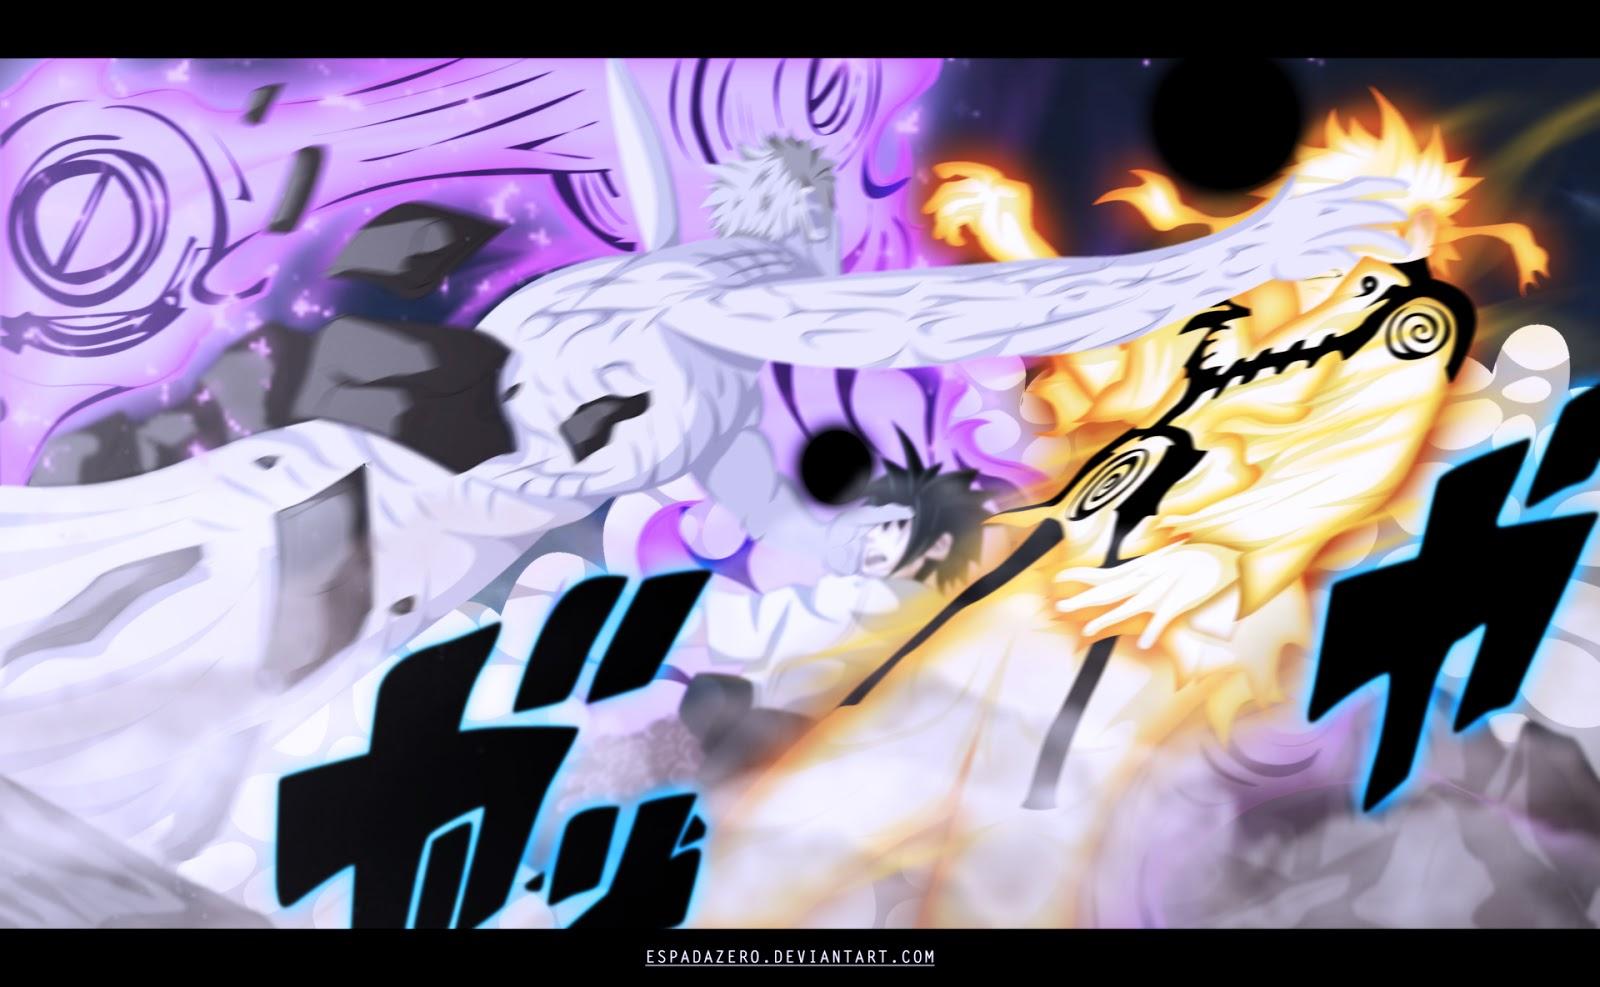 Uchiha Naruto Uzumaki Anime HD Wallpaper Desktop PC Background 1786 1600x987